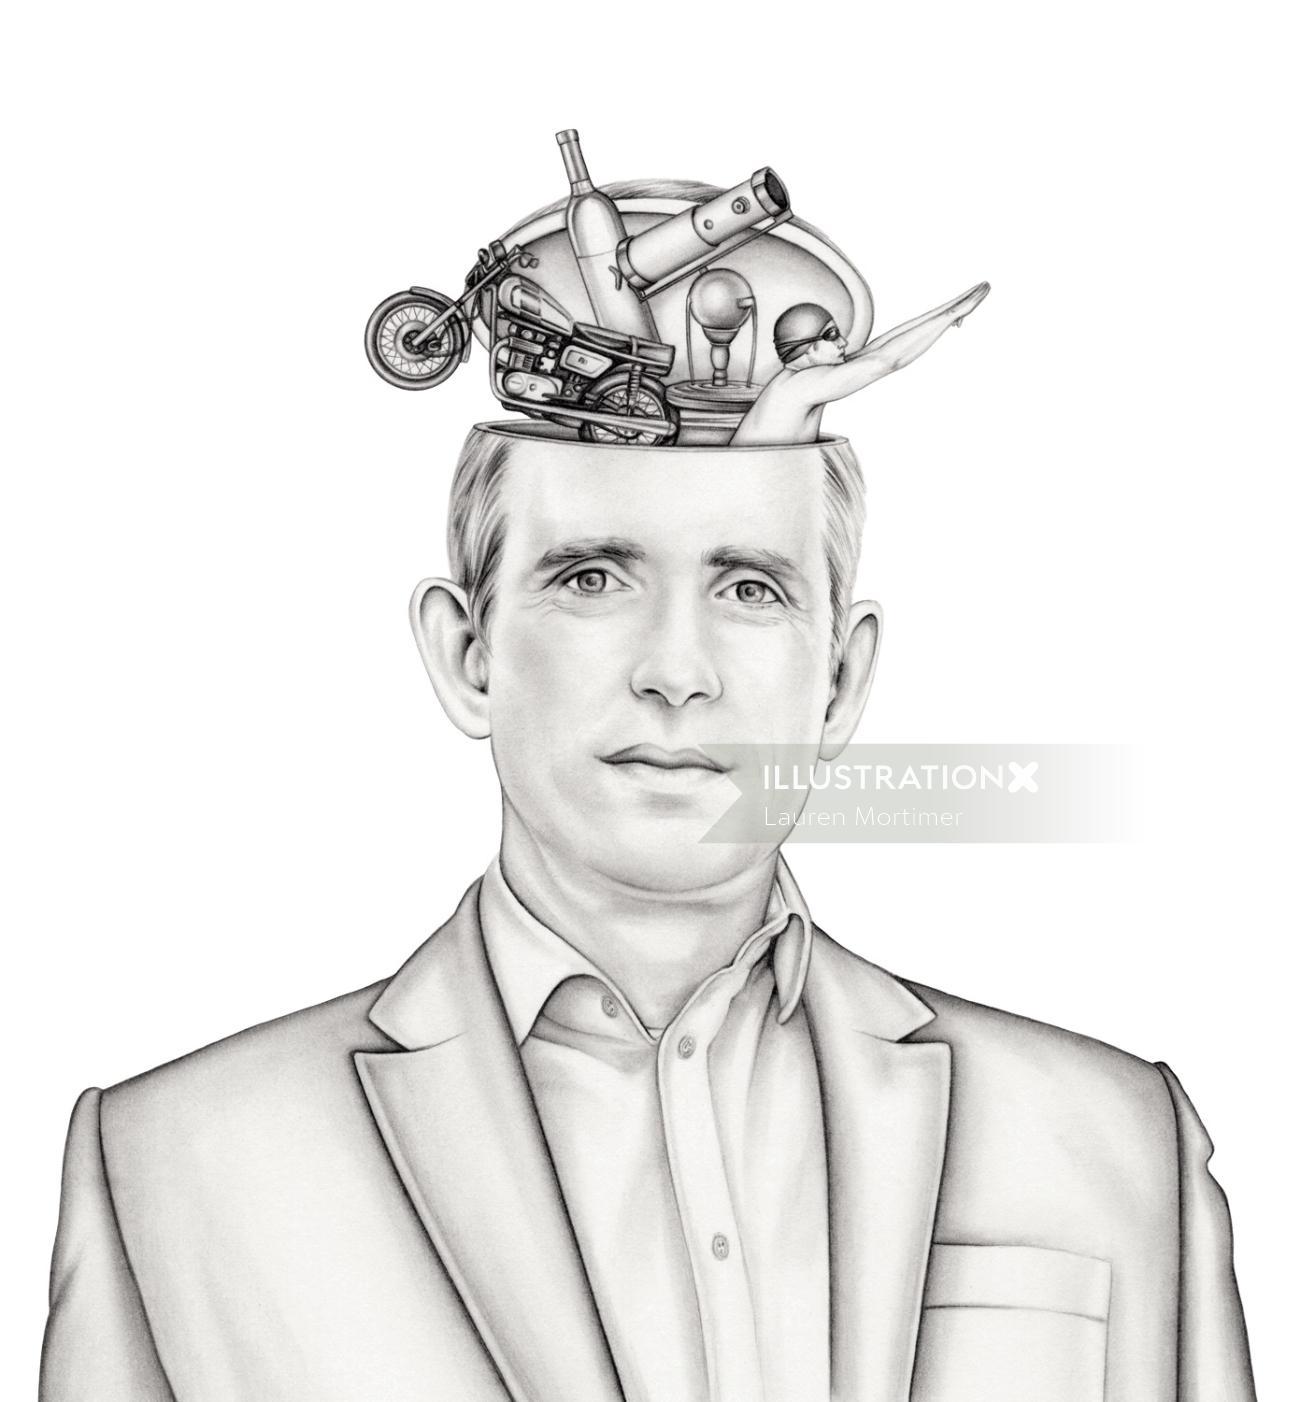 Man headspace Pencil Sketch By Lauren Mortimer